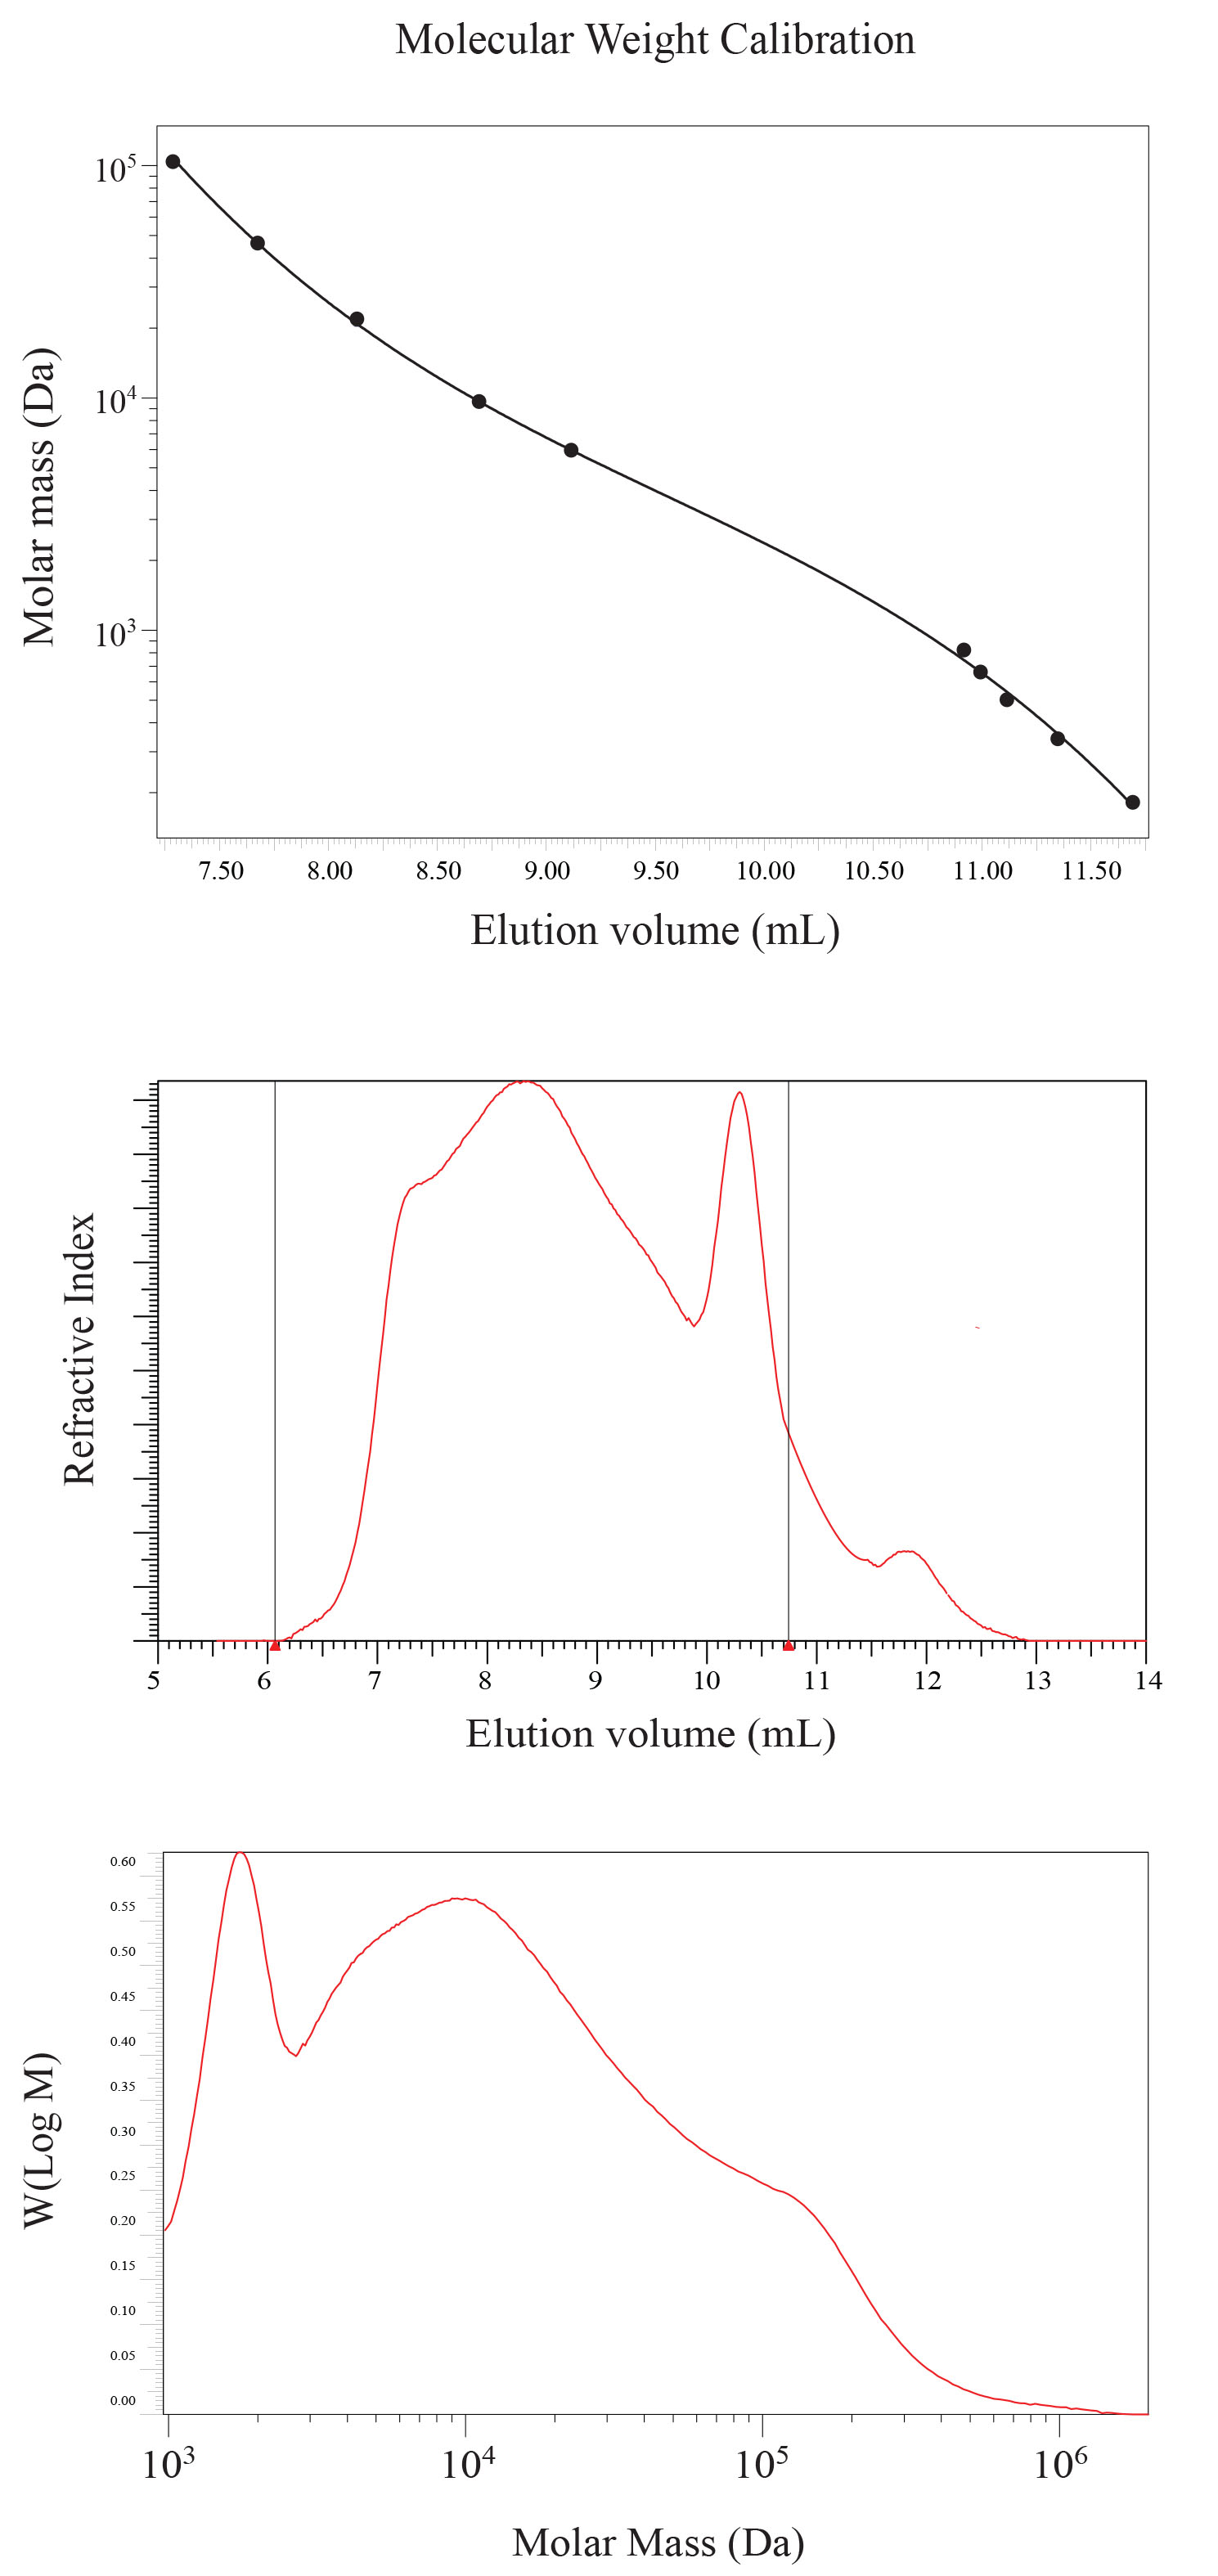 Molecular weight distribution